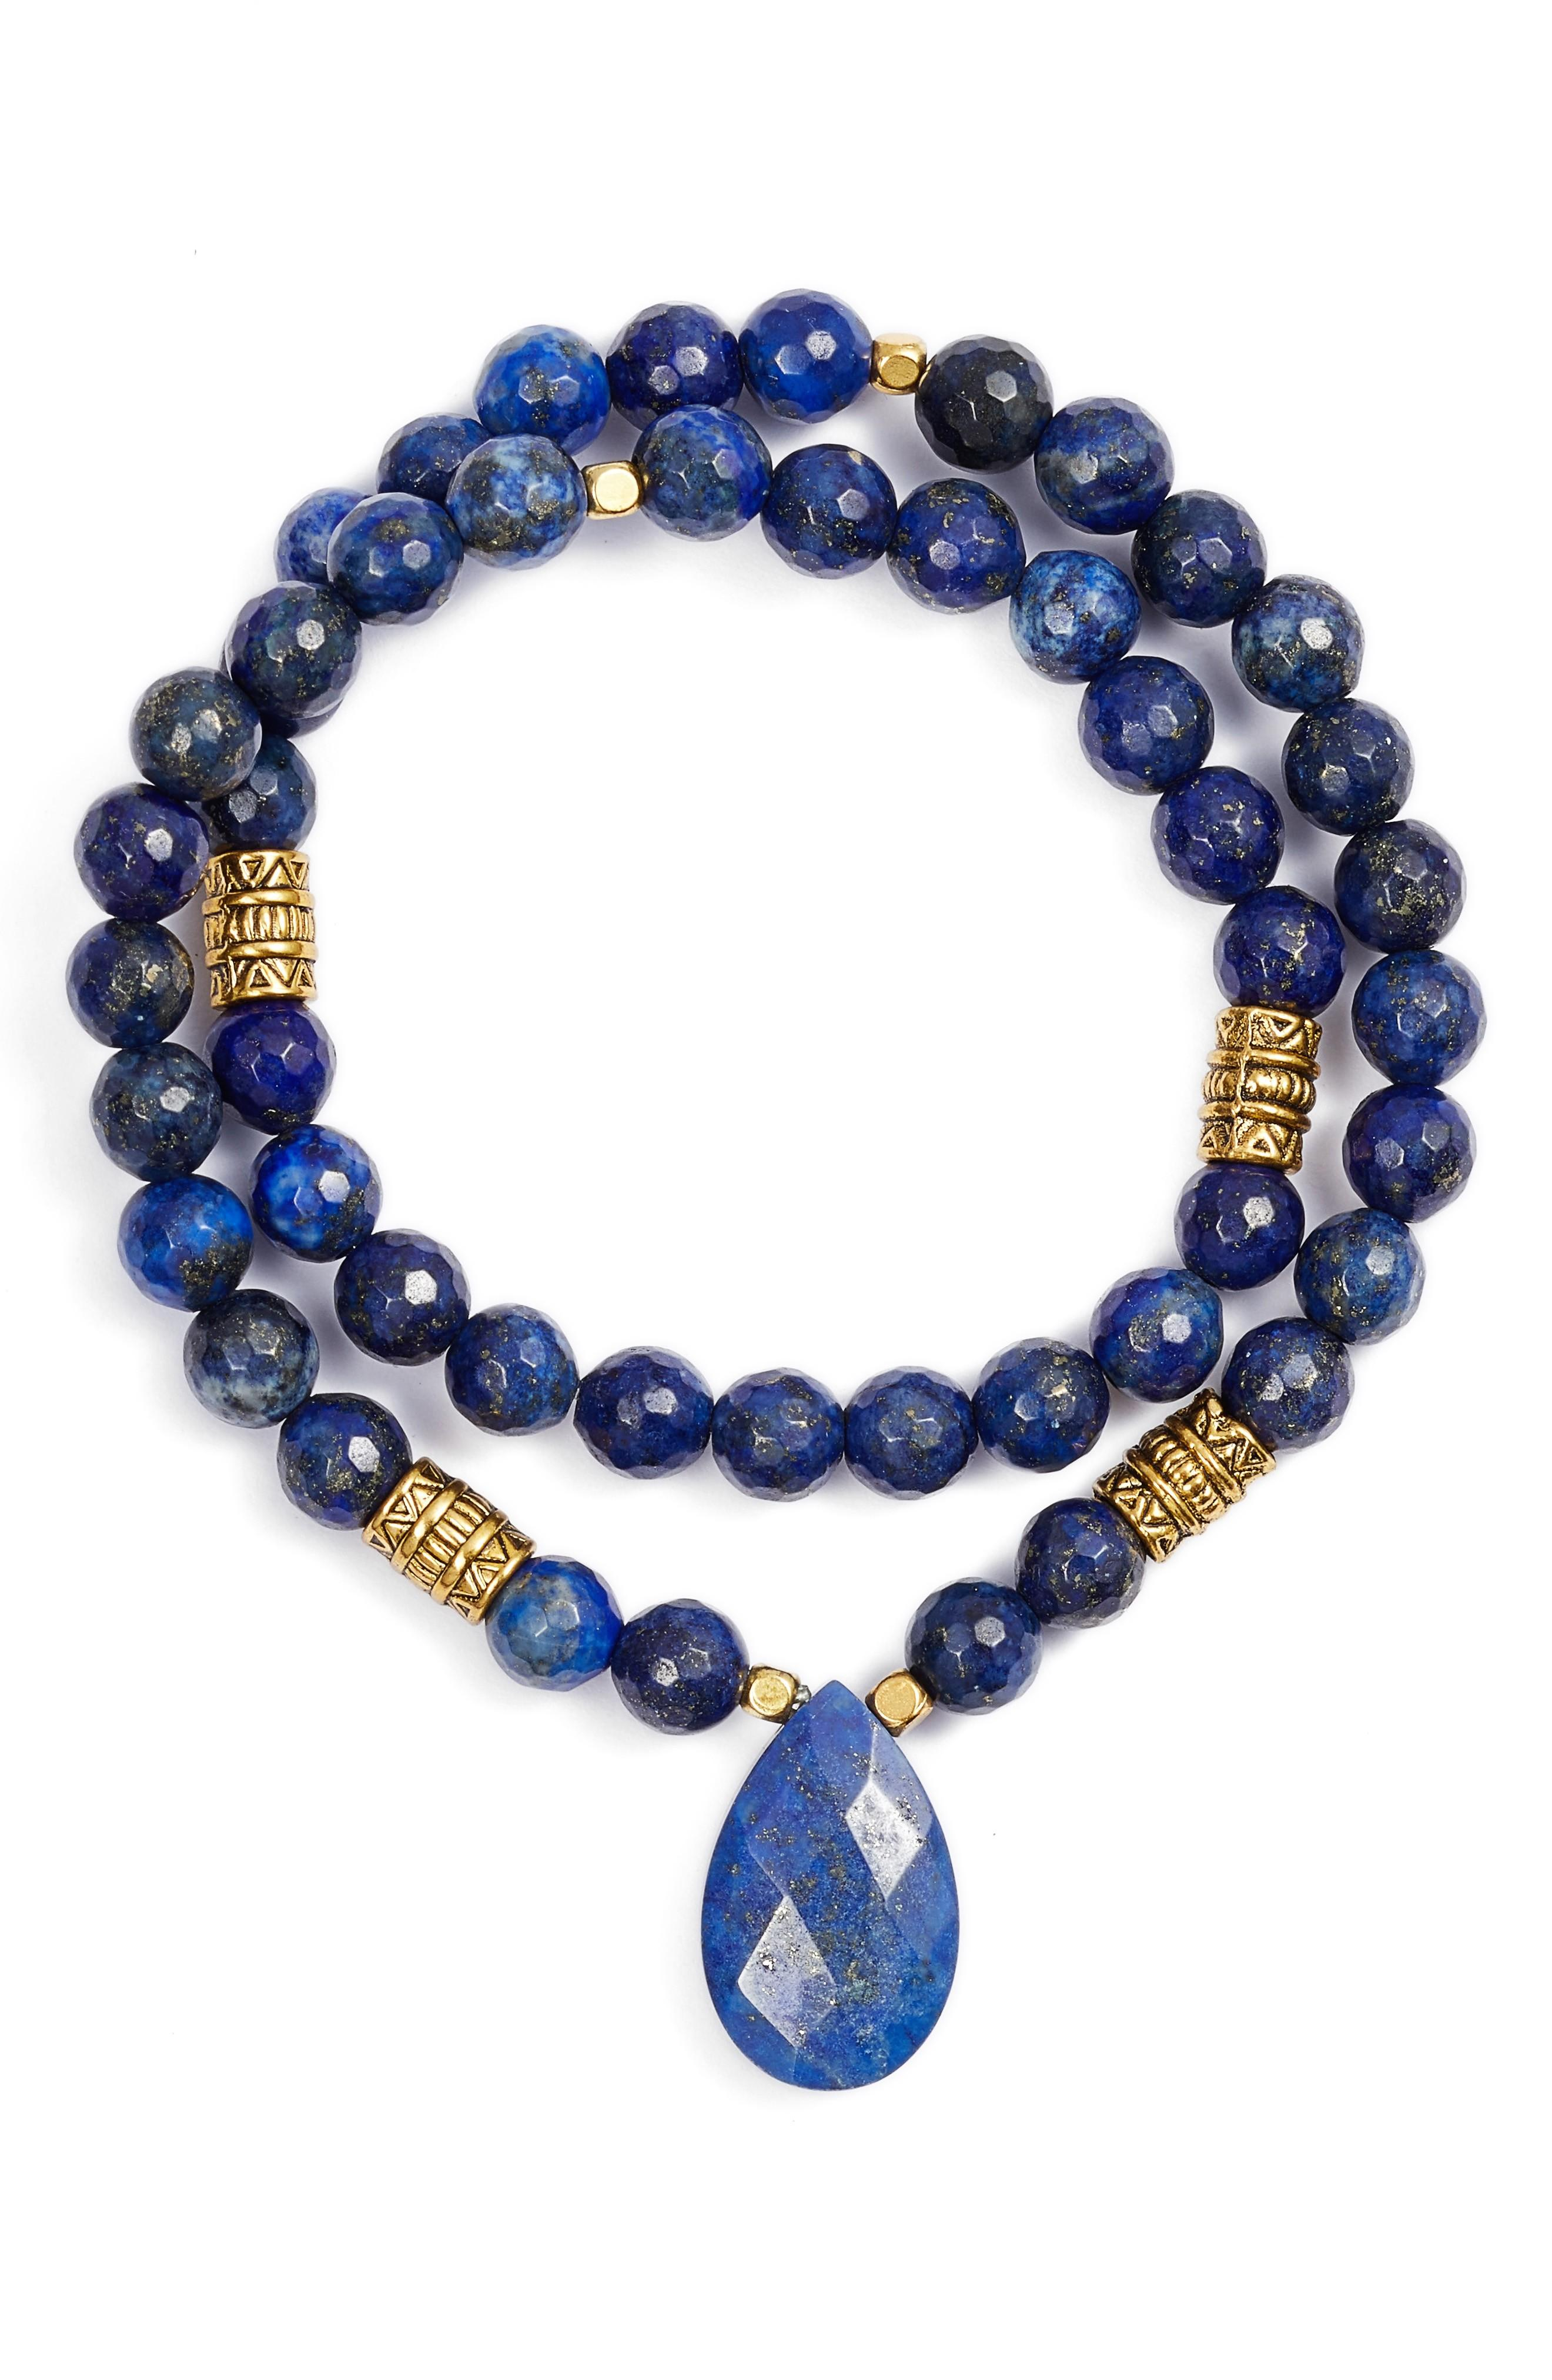 Elise M. Inca Double Stretch Stone Bracelet In Blue Lapis